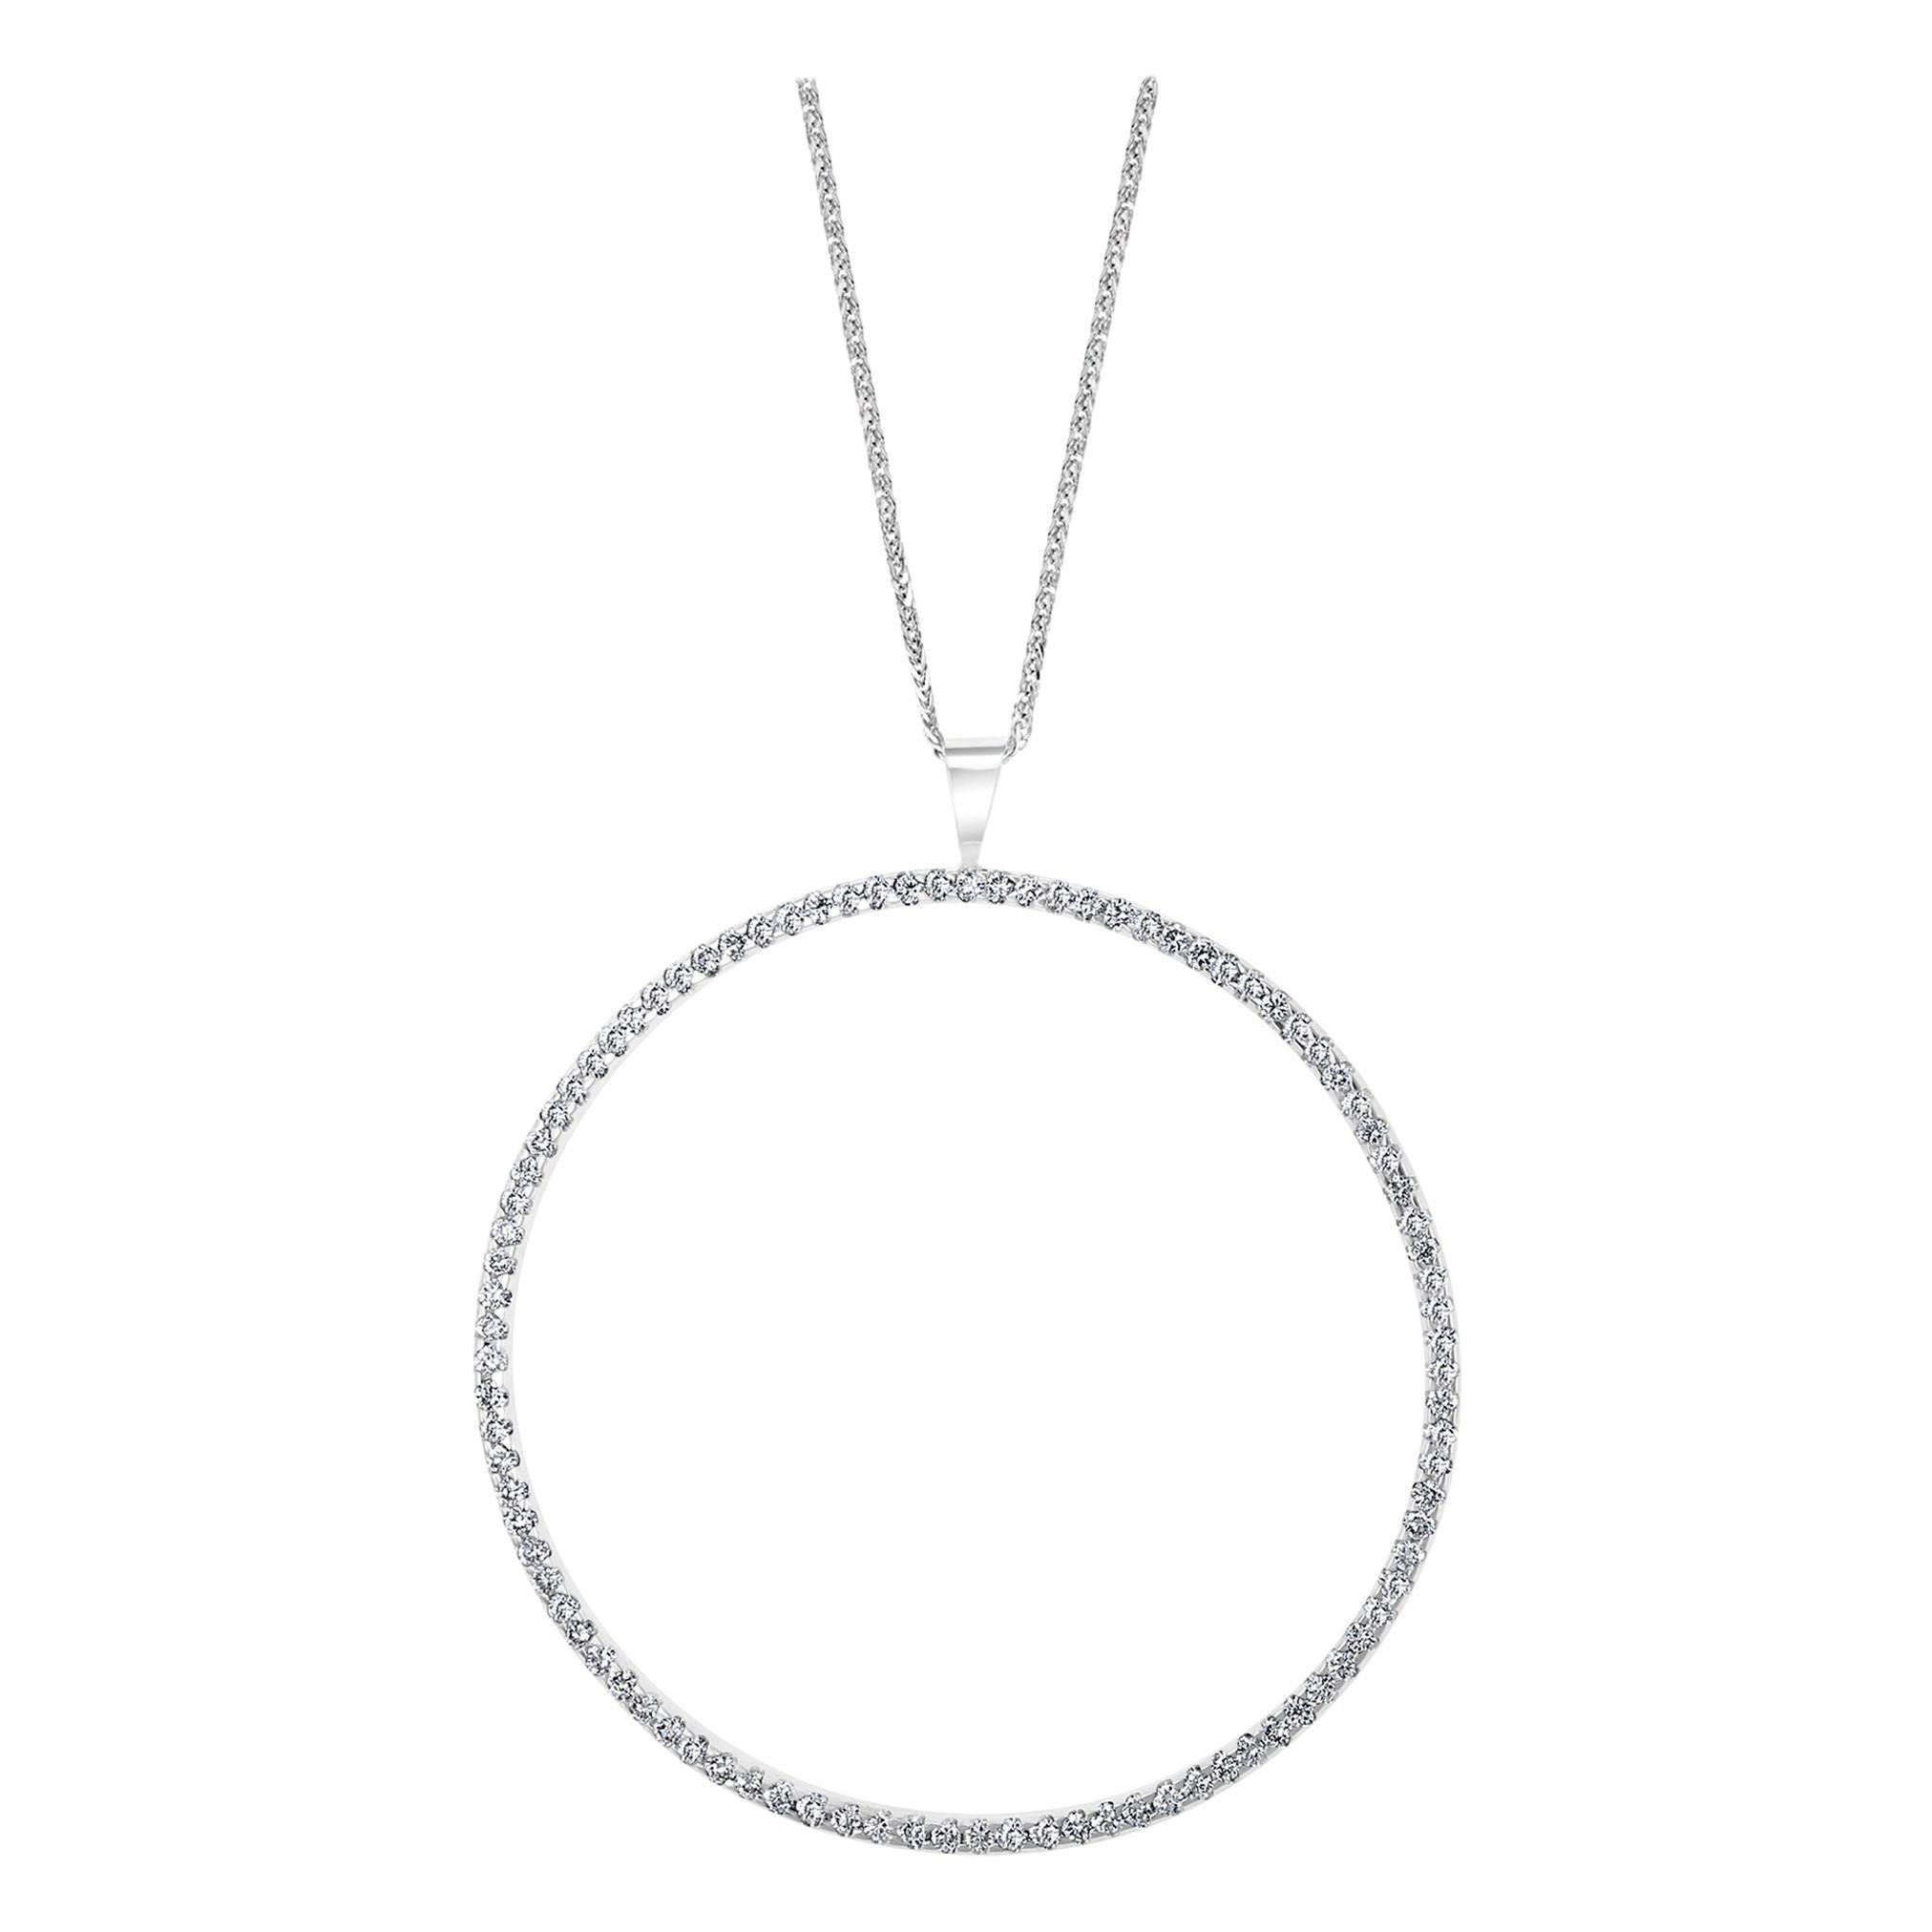 Large Diamond Circle Pendant/ Necklace 18 Karat White Gold with 14 K Gold Chain